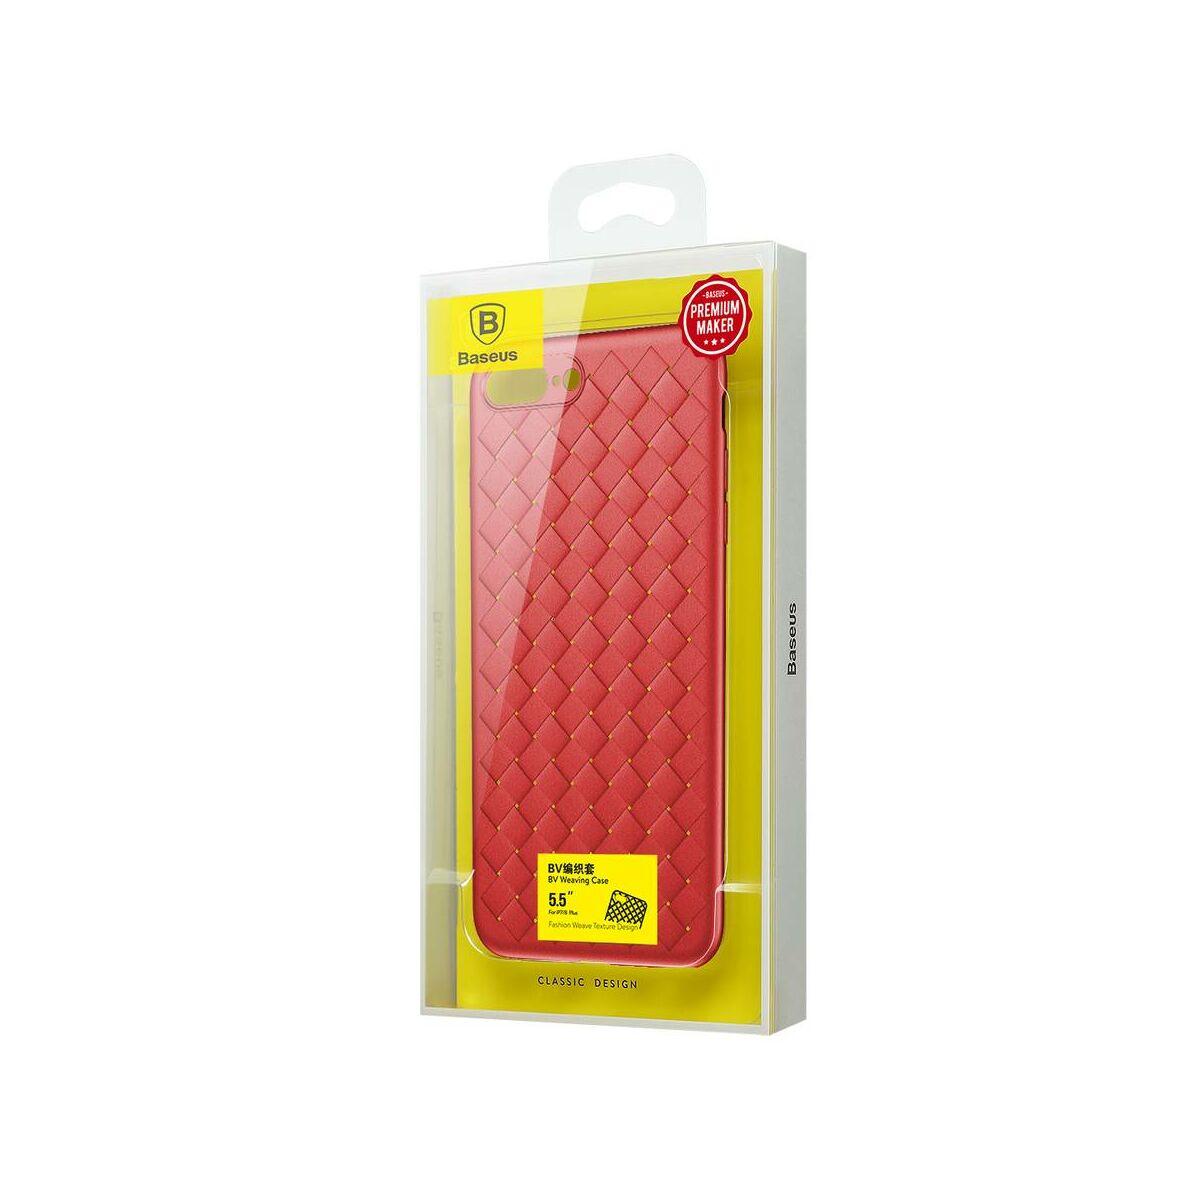 Baseus iPhone 8/7 Plus tok, BV Weaving, piros (WIAPIPH8P-BV09)